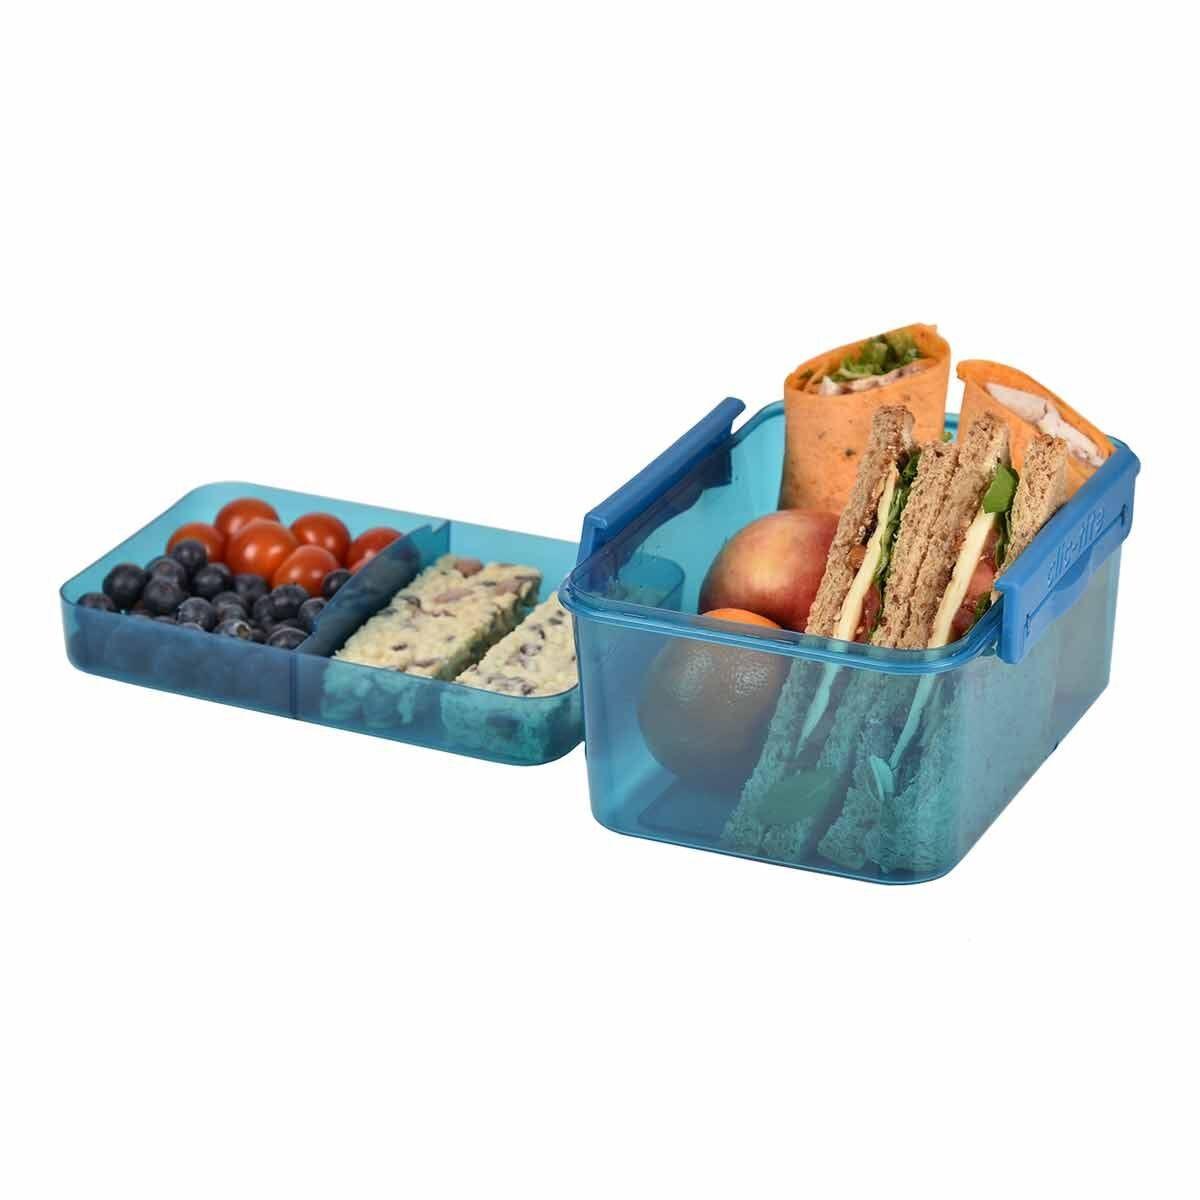 Polar Gear Clic-Tite Double Decker Xl 1.7L Food Container Blue